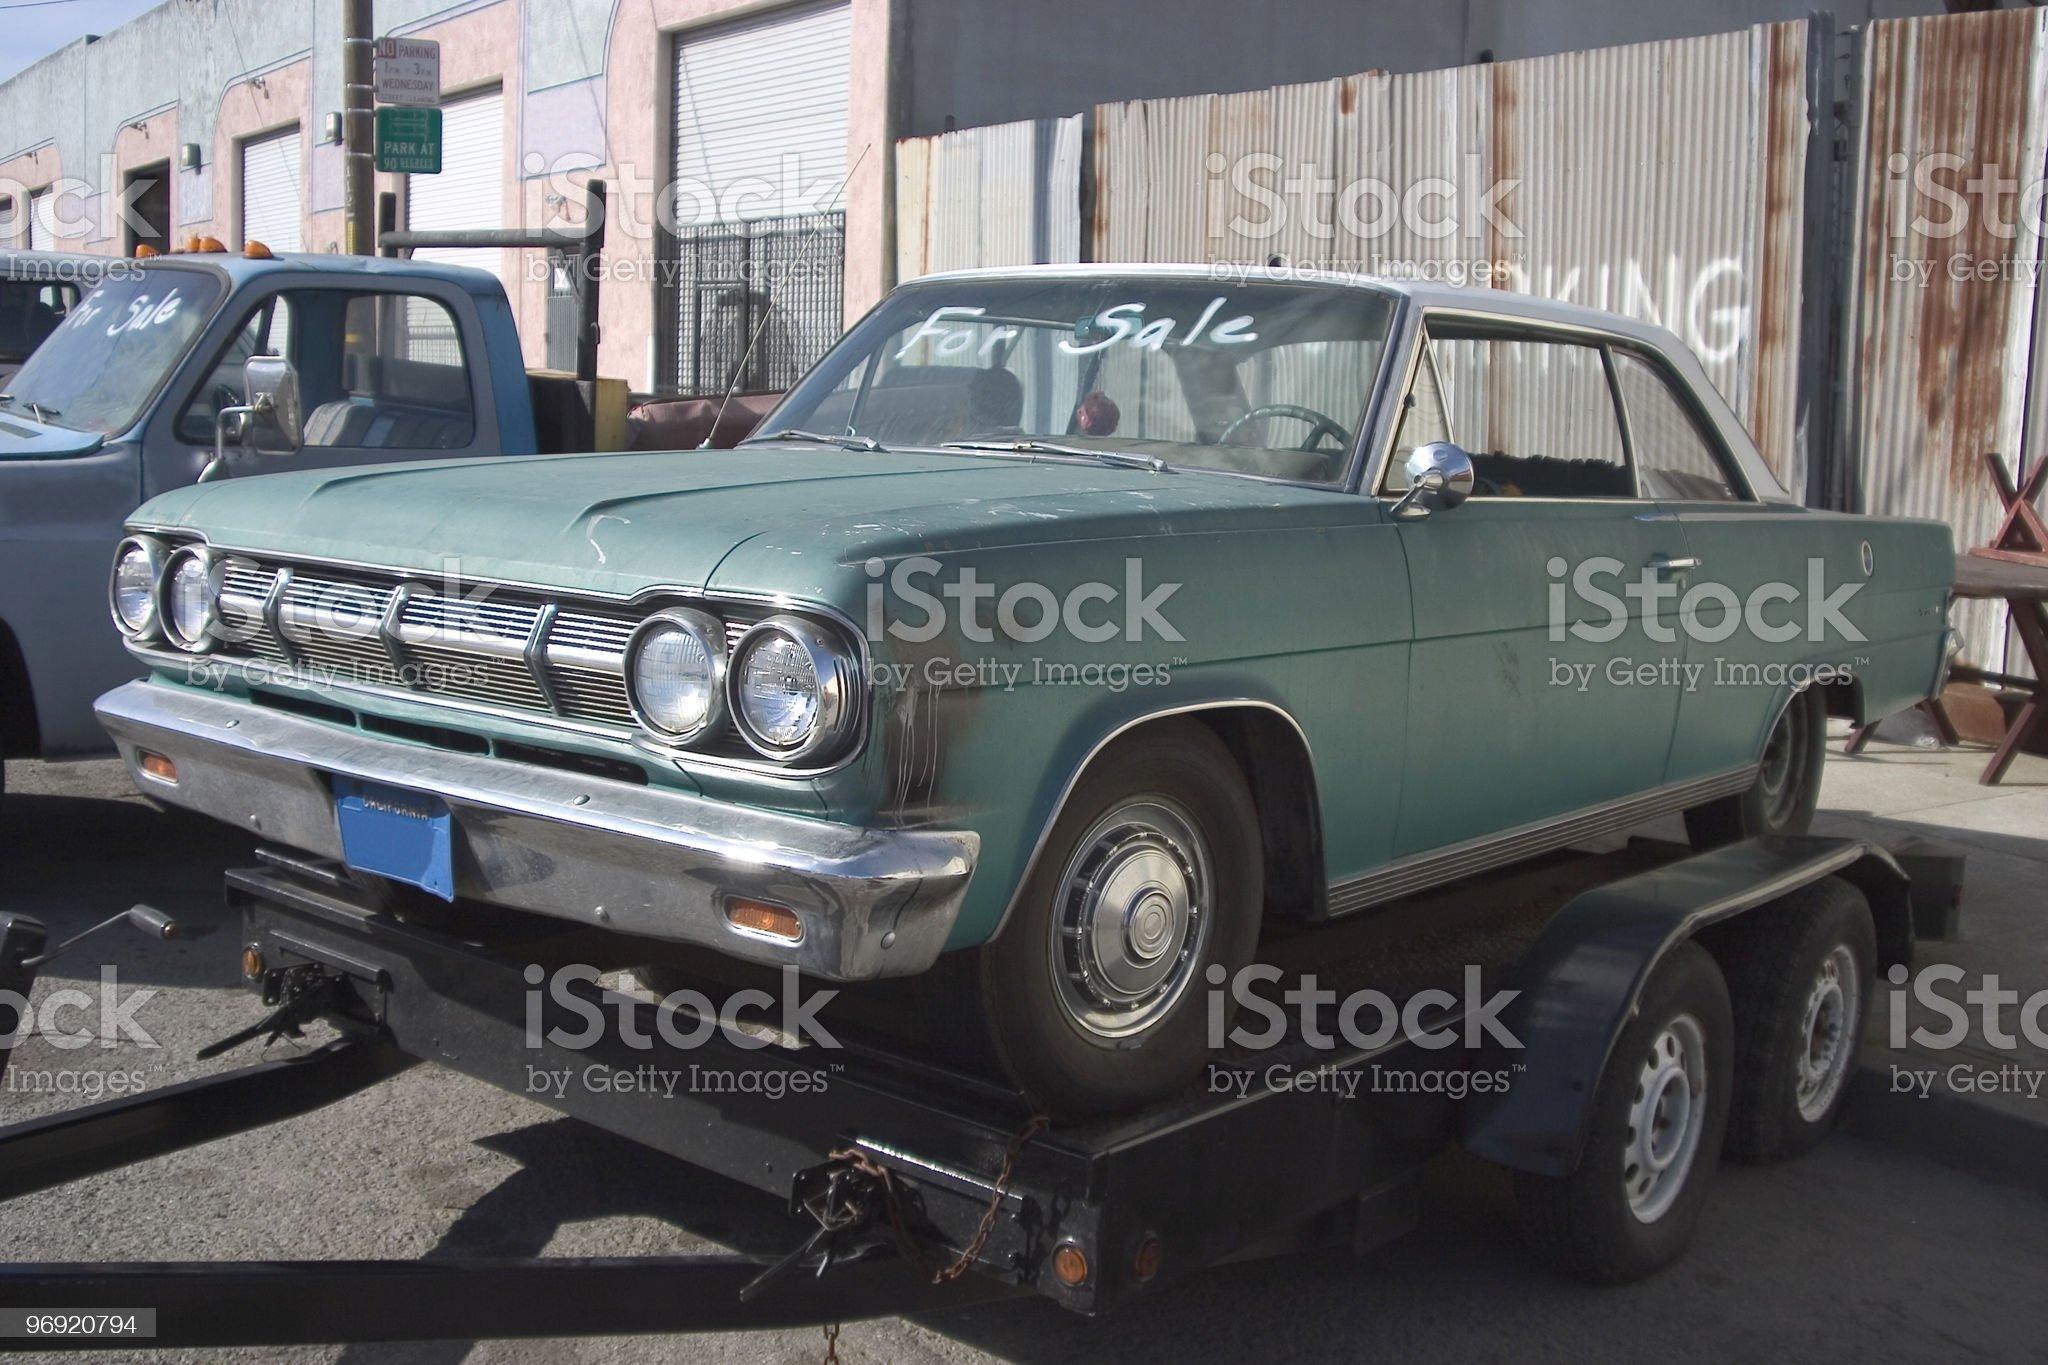 Used Car royalty-free stock photo